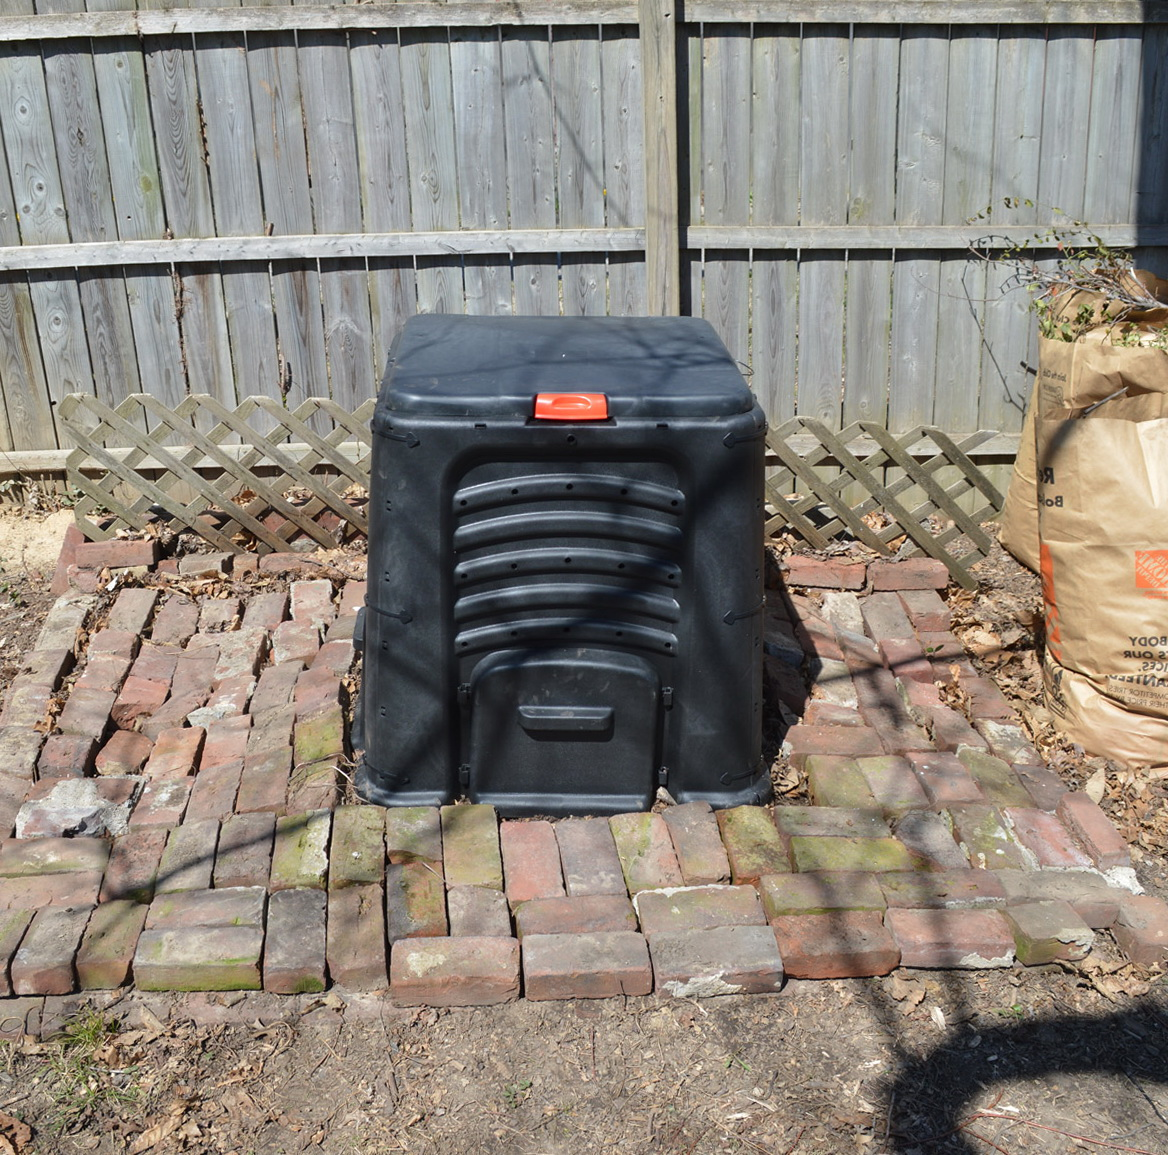 Kitchen Compost Bin Lowes